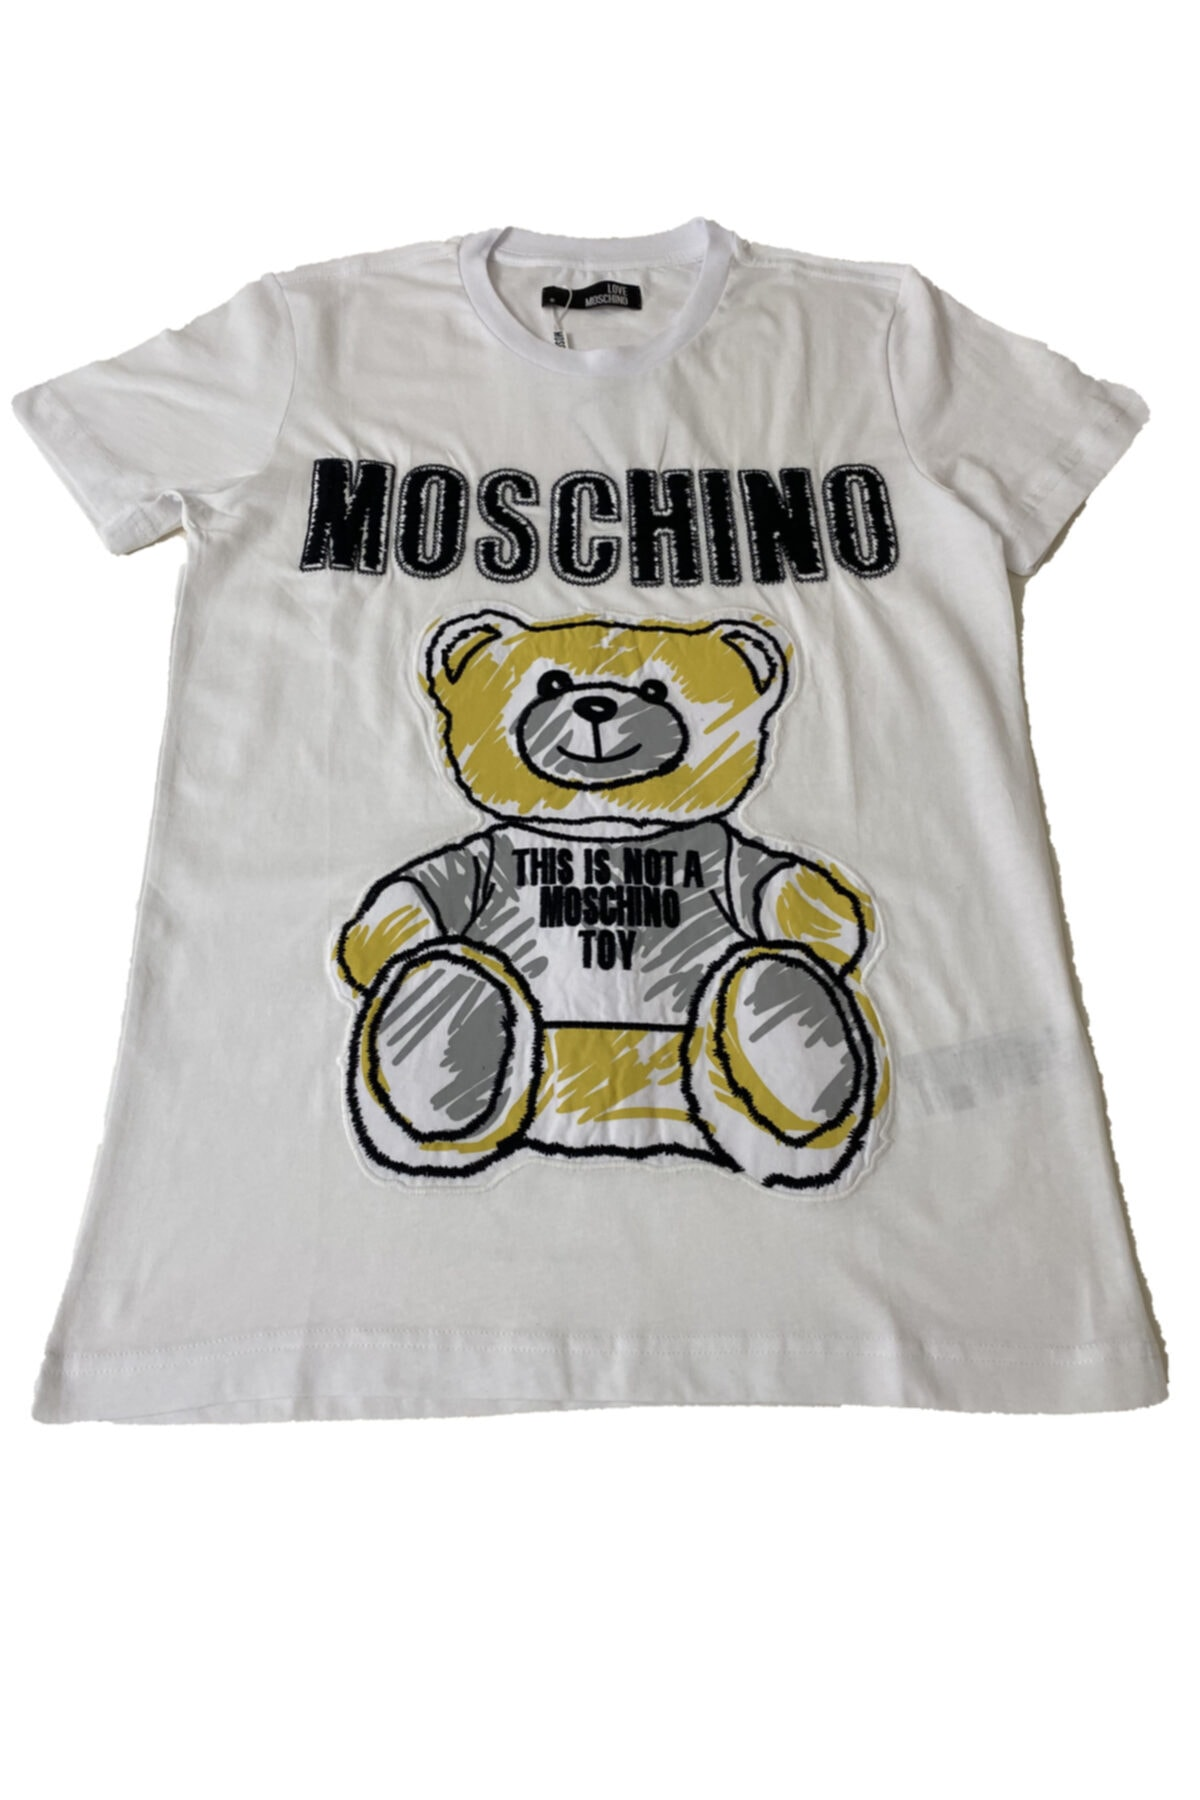 Moschino Ayıcıklı Unisex Tshirt 1